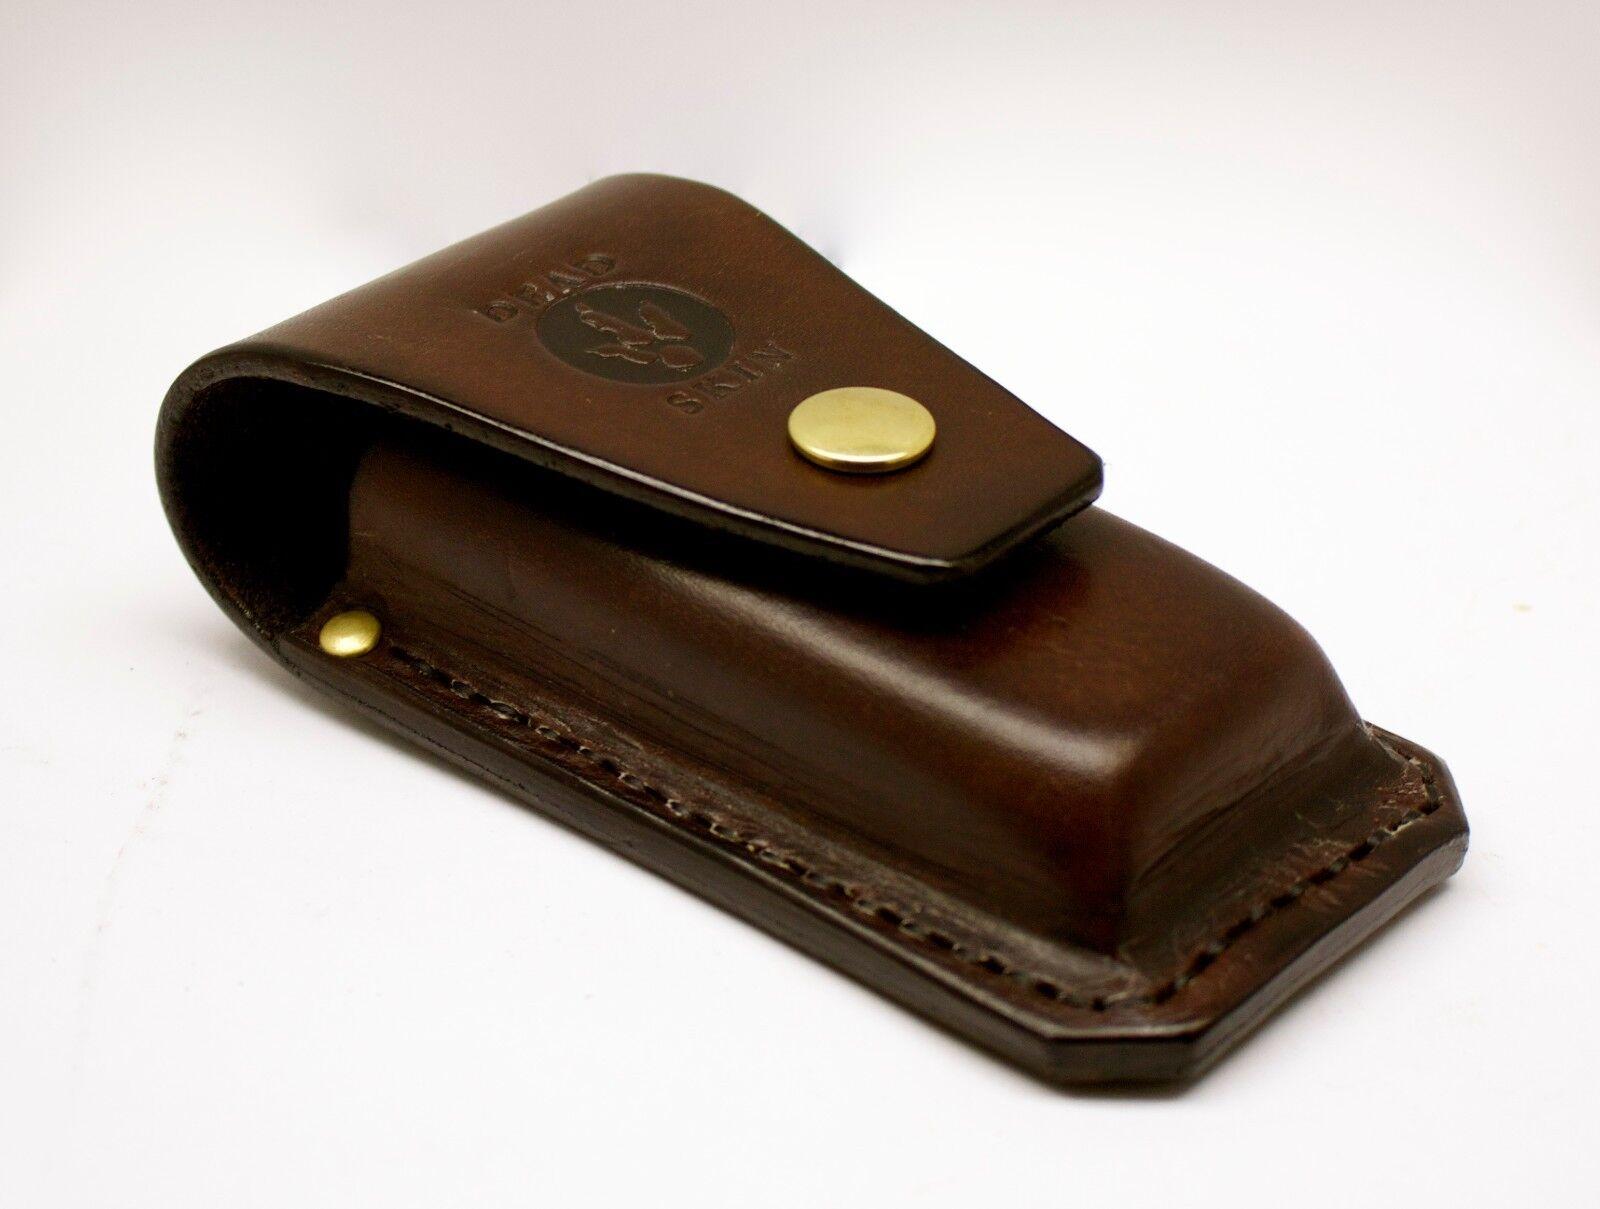 Braun Leder pouch Lederman for Lederman pouch multitool SURGE 300 handmade by Deadskin AU 6a064e